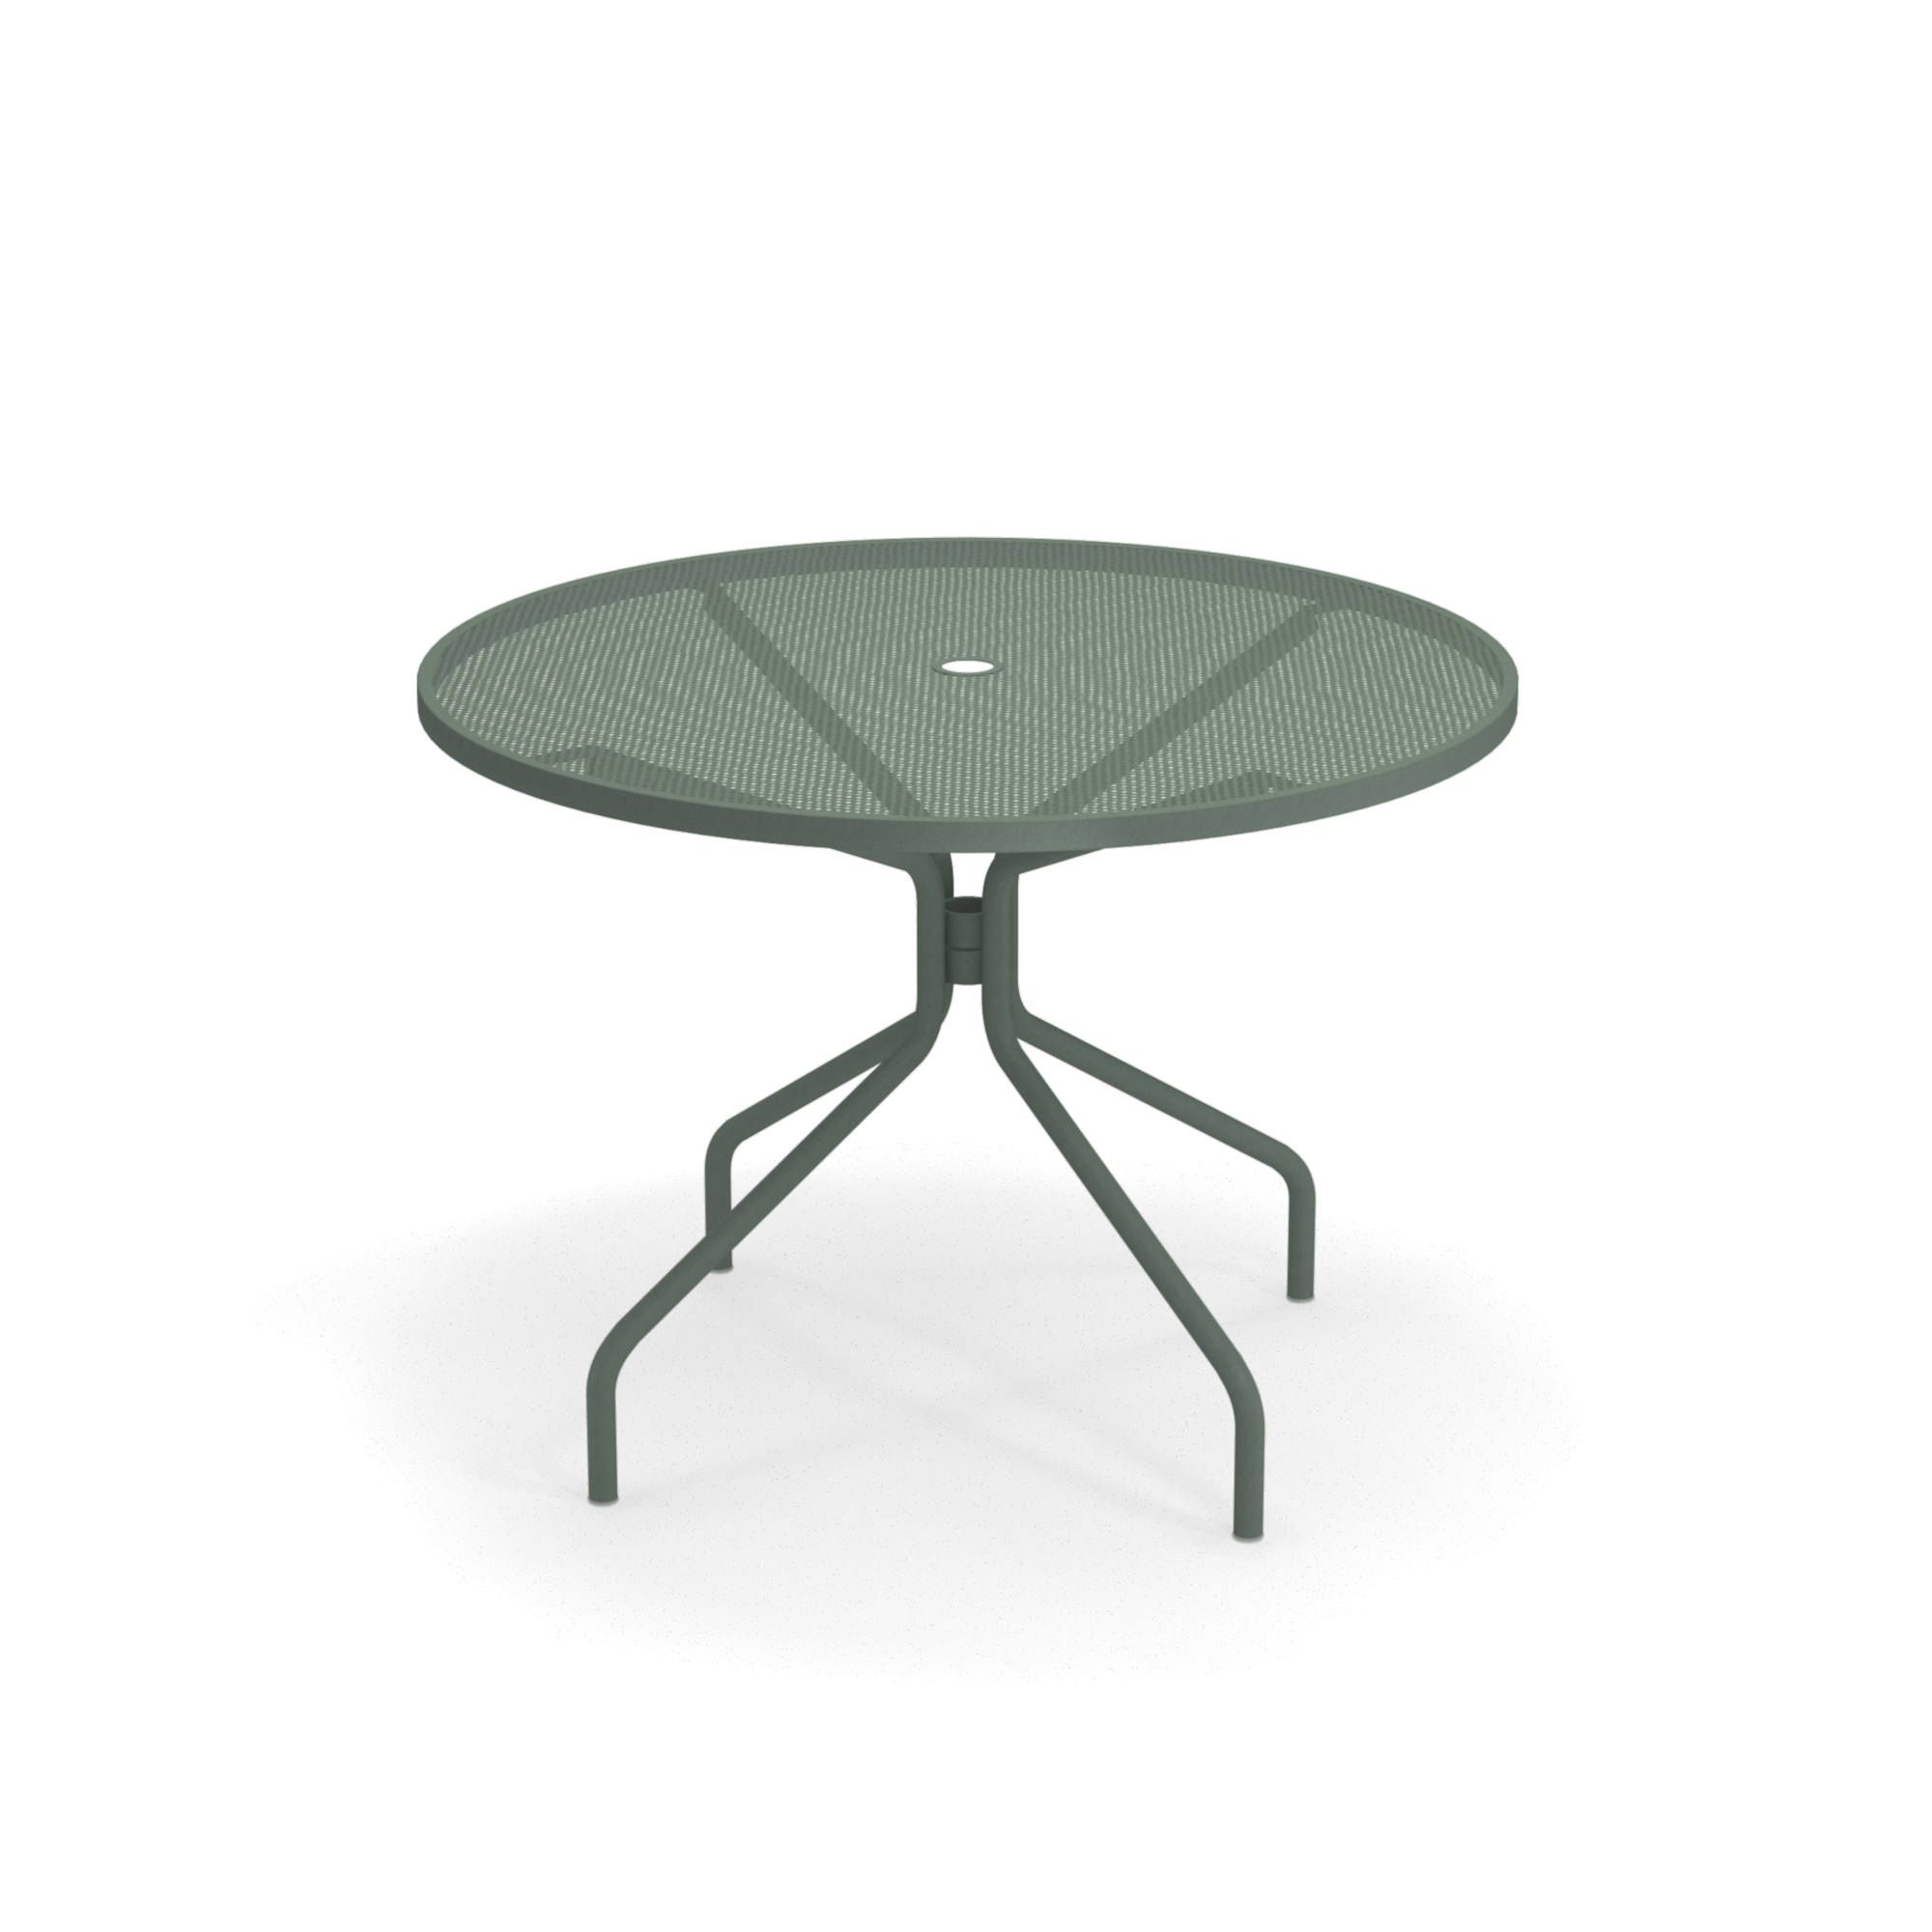 emuamericas, llc 804-75 table, outdoor